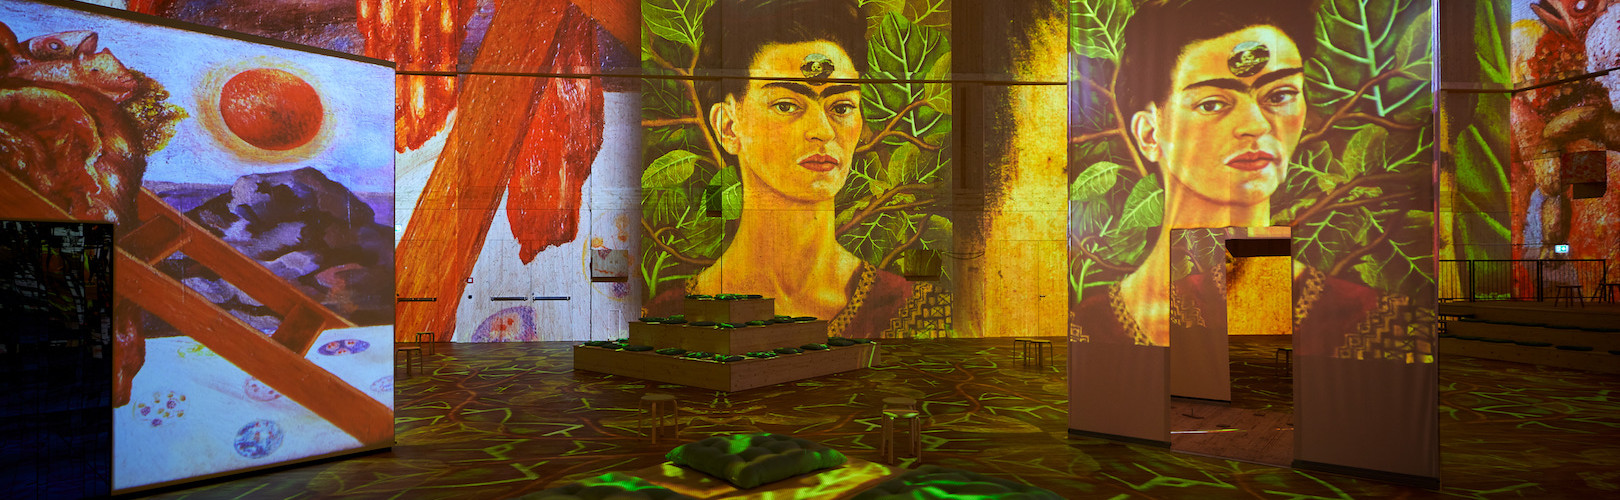 """Viva Frida Kahlo - Immersive Experience"", photo Andy Juchli"